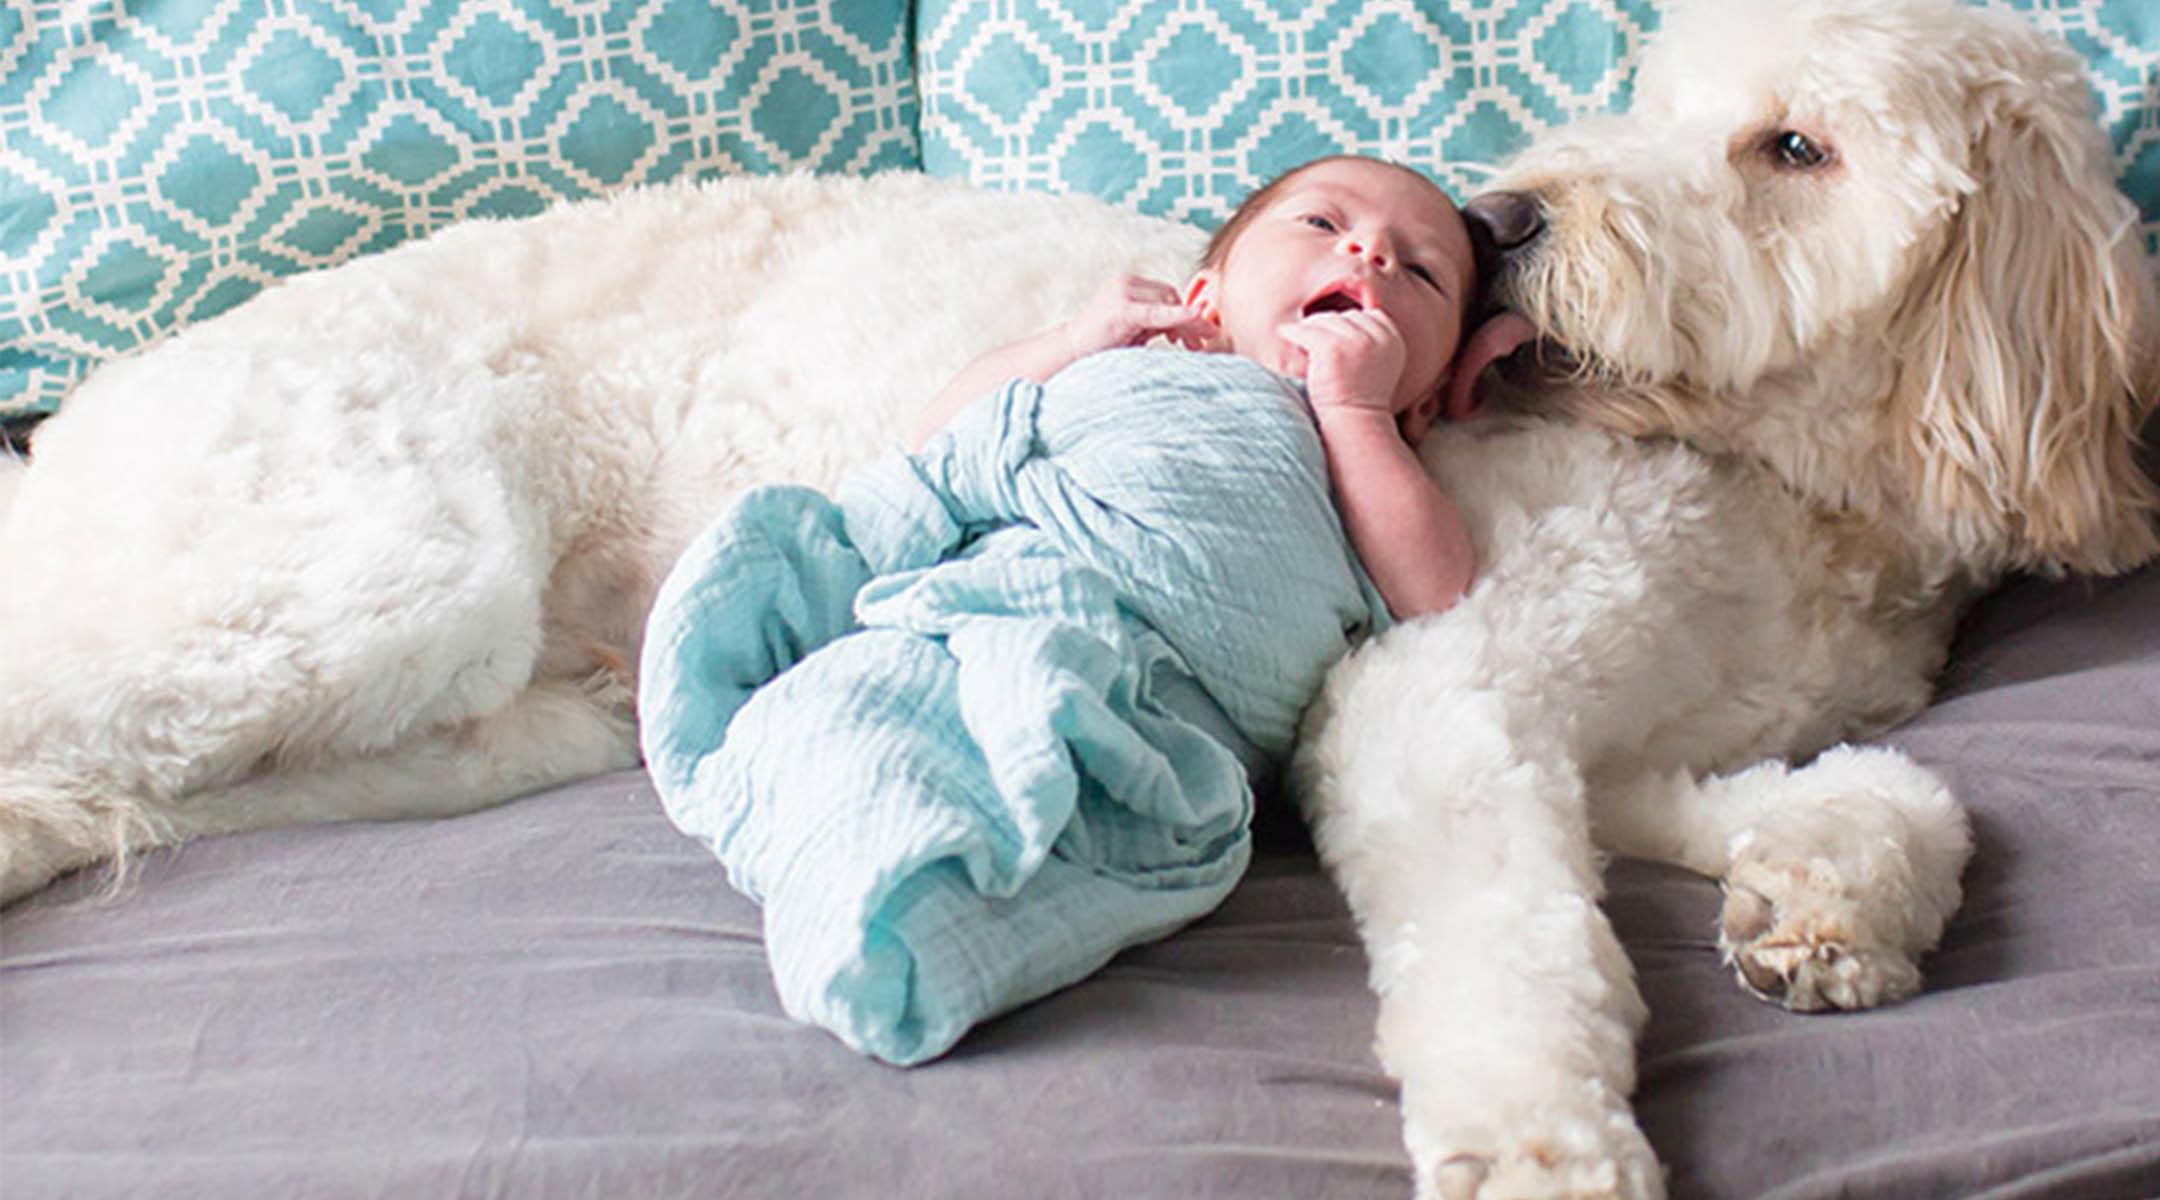 Dog To Your Newborn